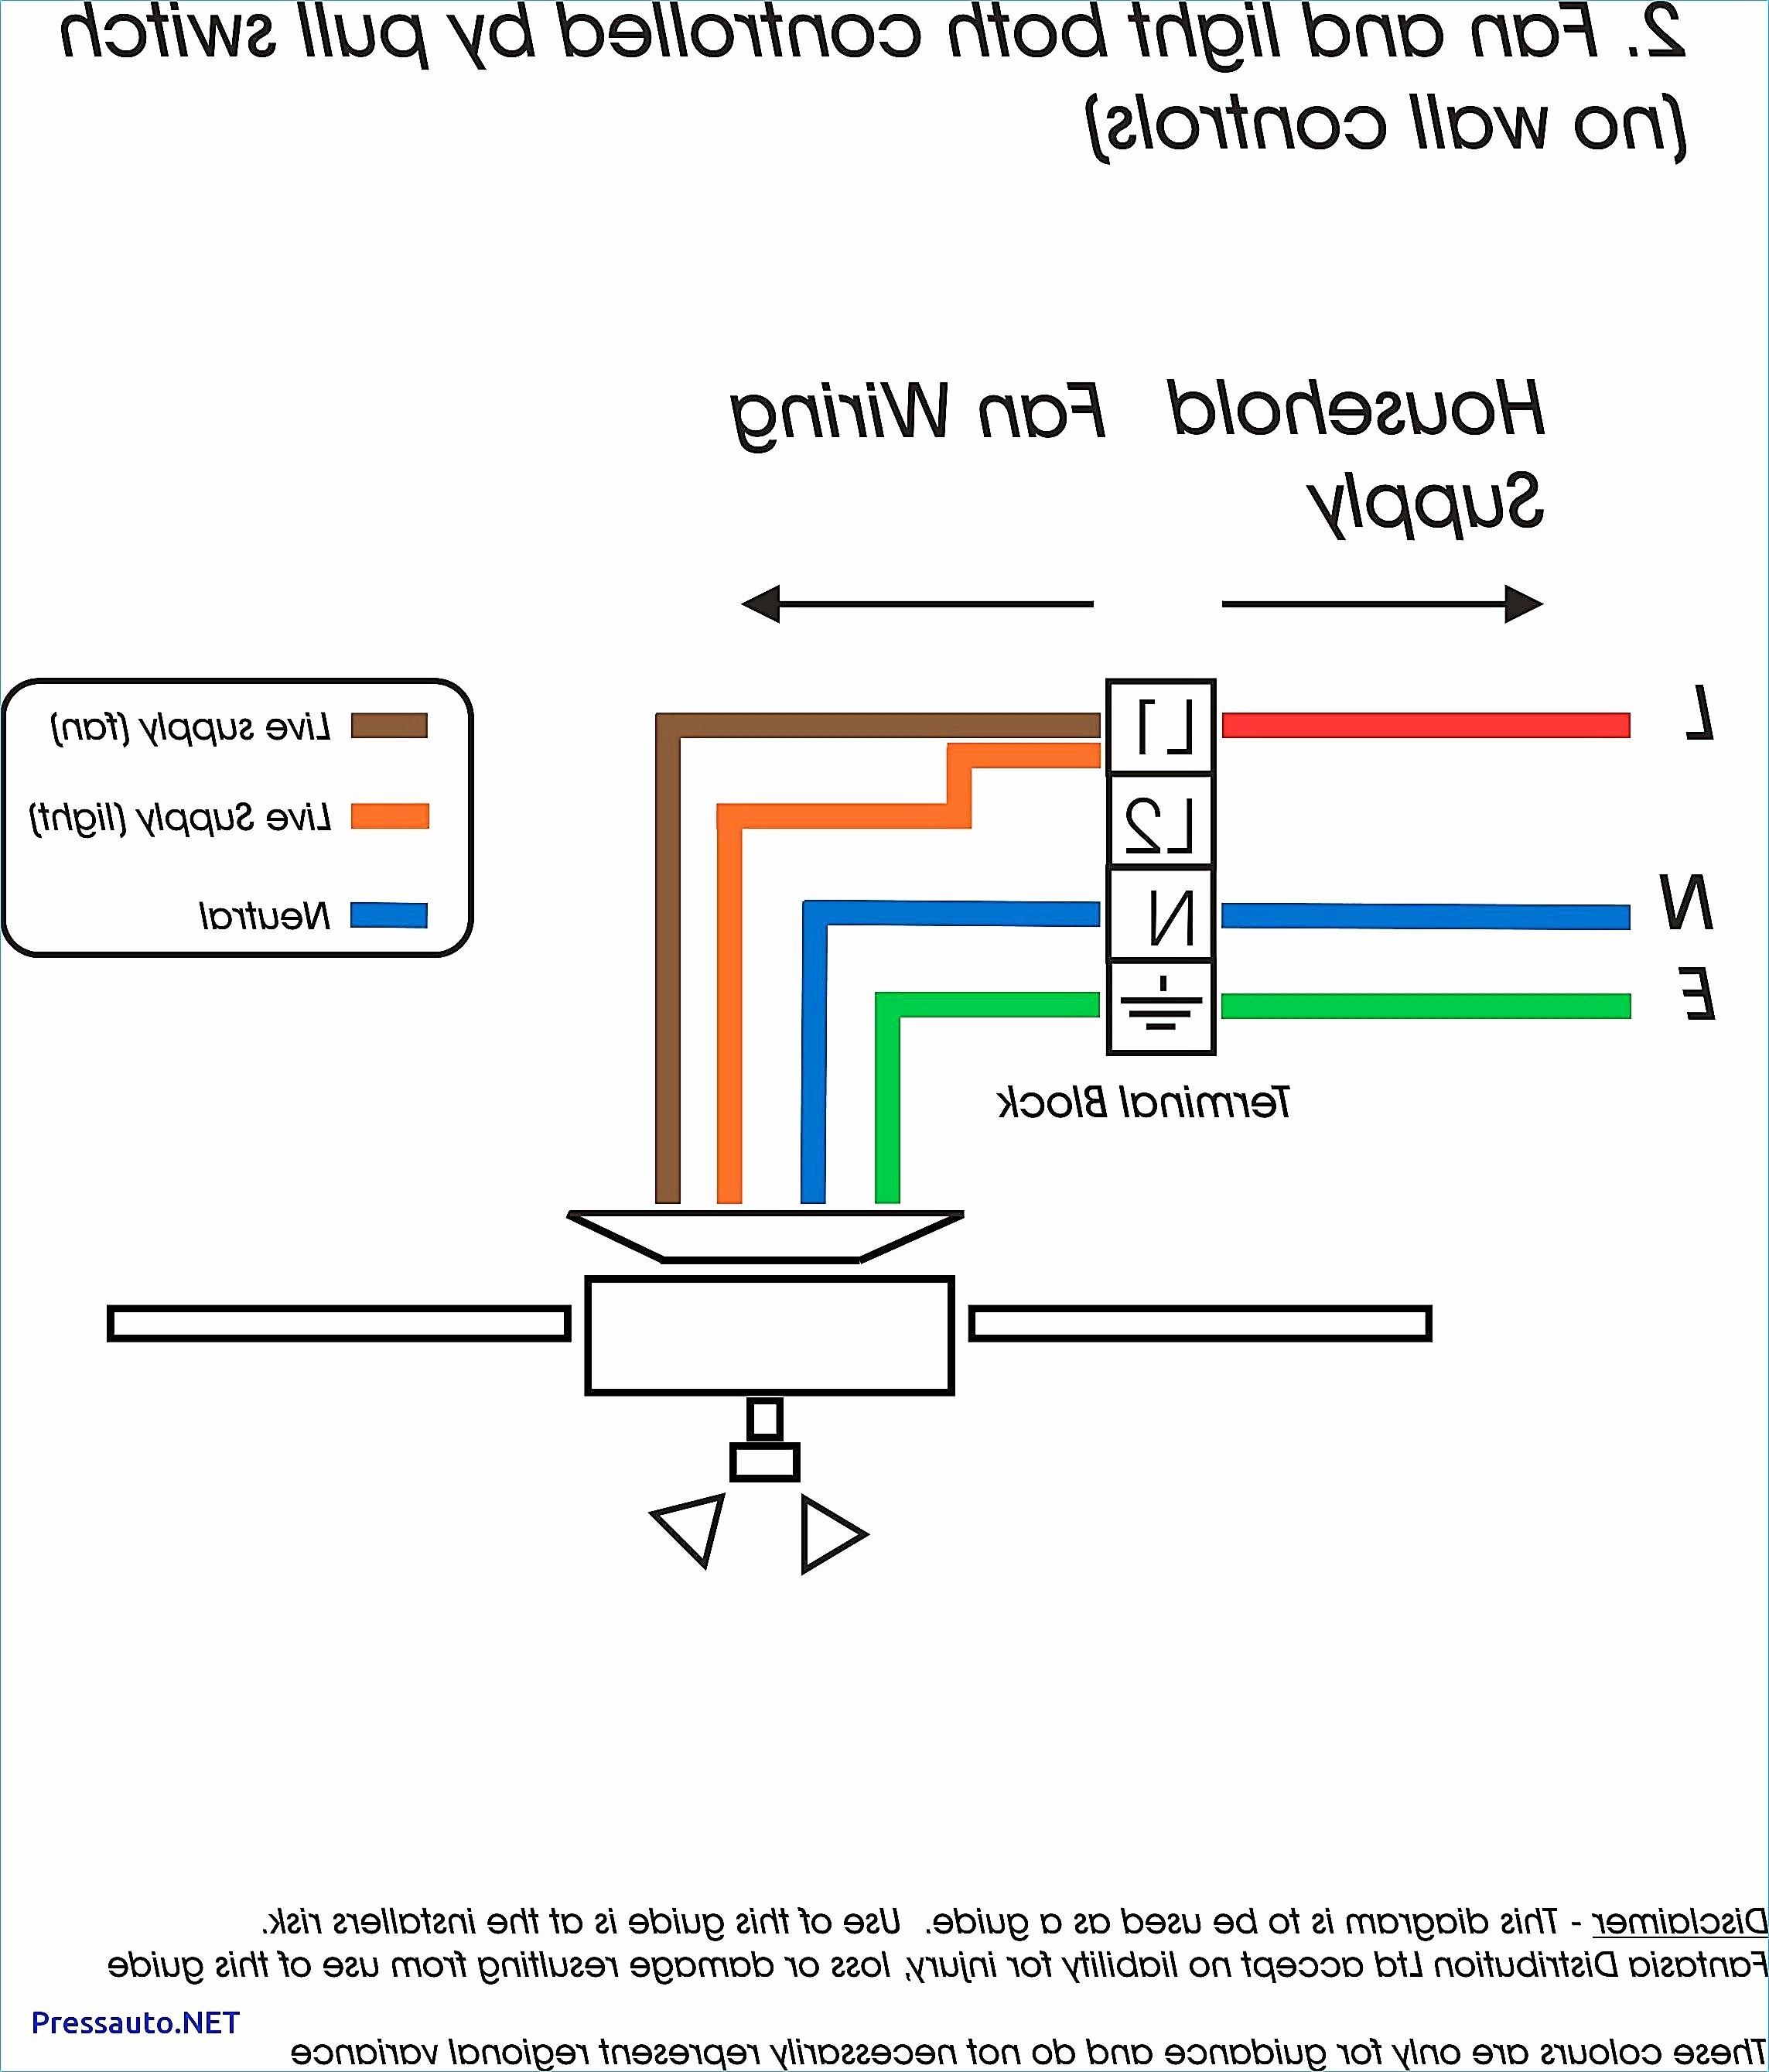 porch light wiring diagram elegant wiring diagram image rh mainetreasurechest com Electrical Wiring Diagrams Electrical Schematics Symbols and Meaning